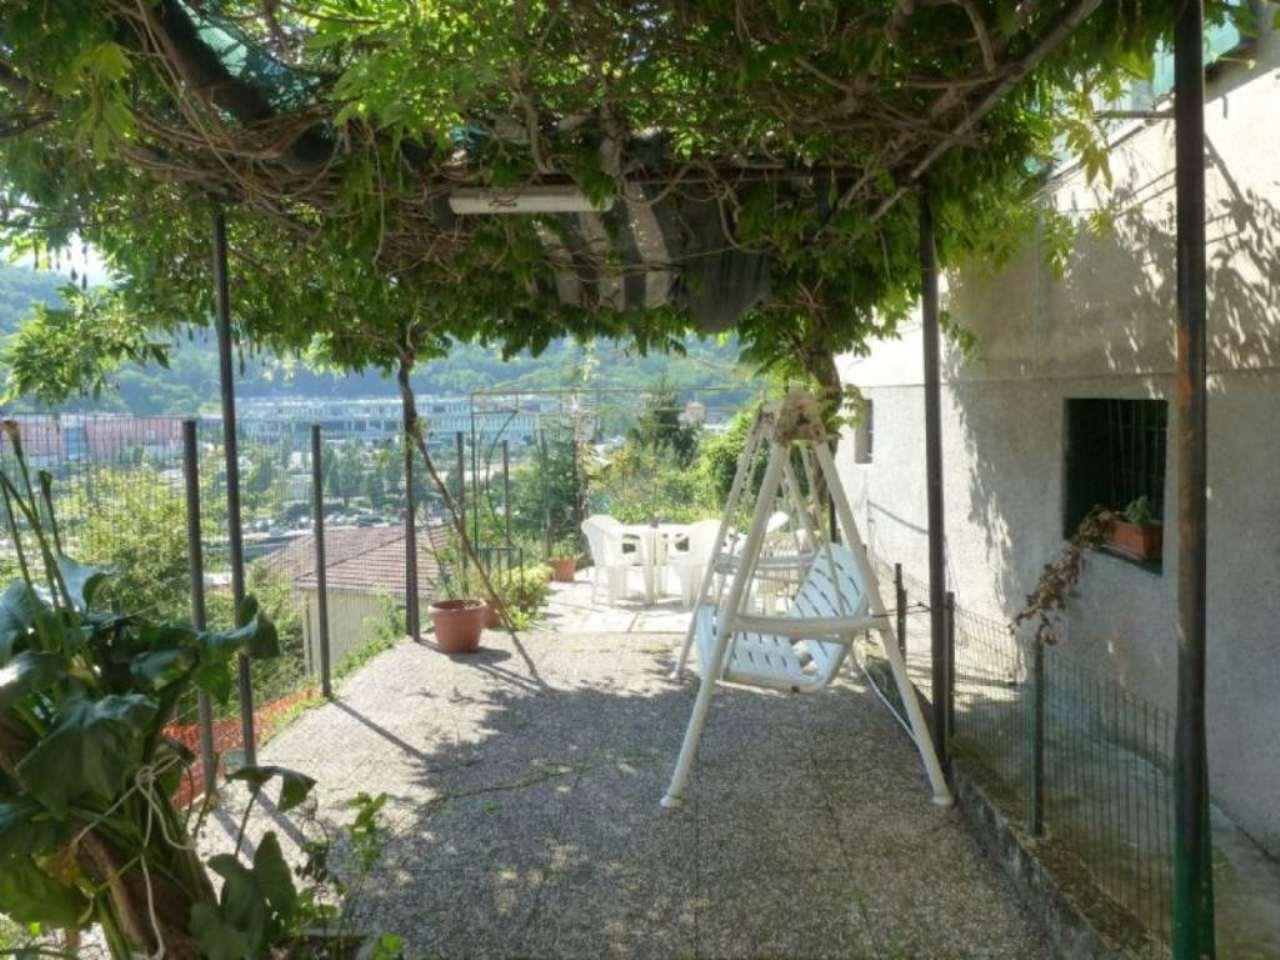 casa con giardino a genova pag. 9 - cambiocasa.it